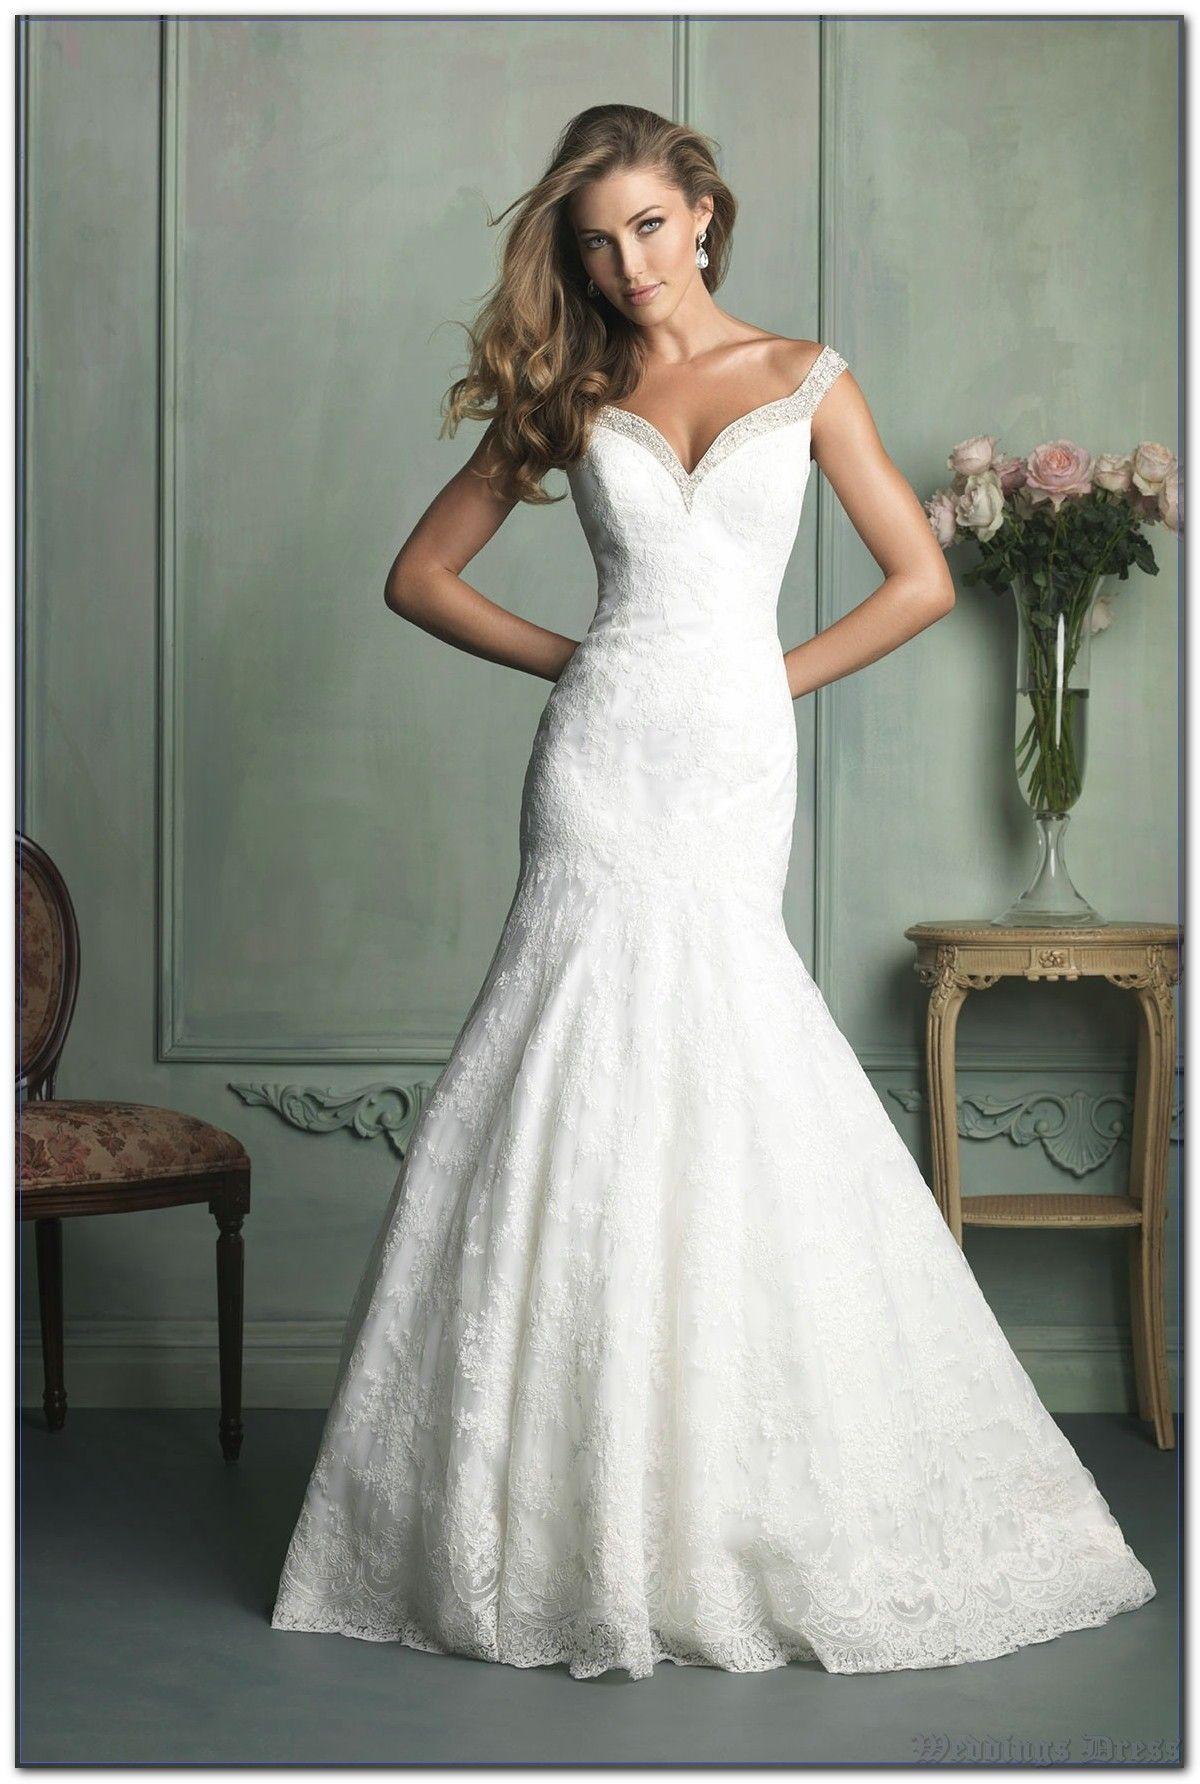 How To Earn 8/Day Using Weddings Dress